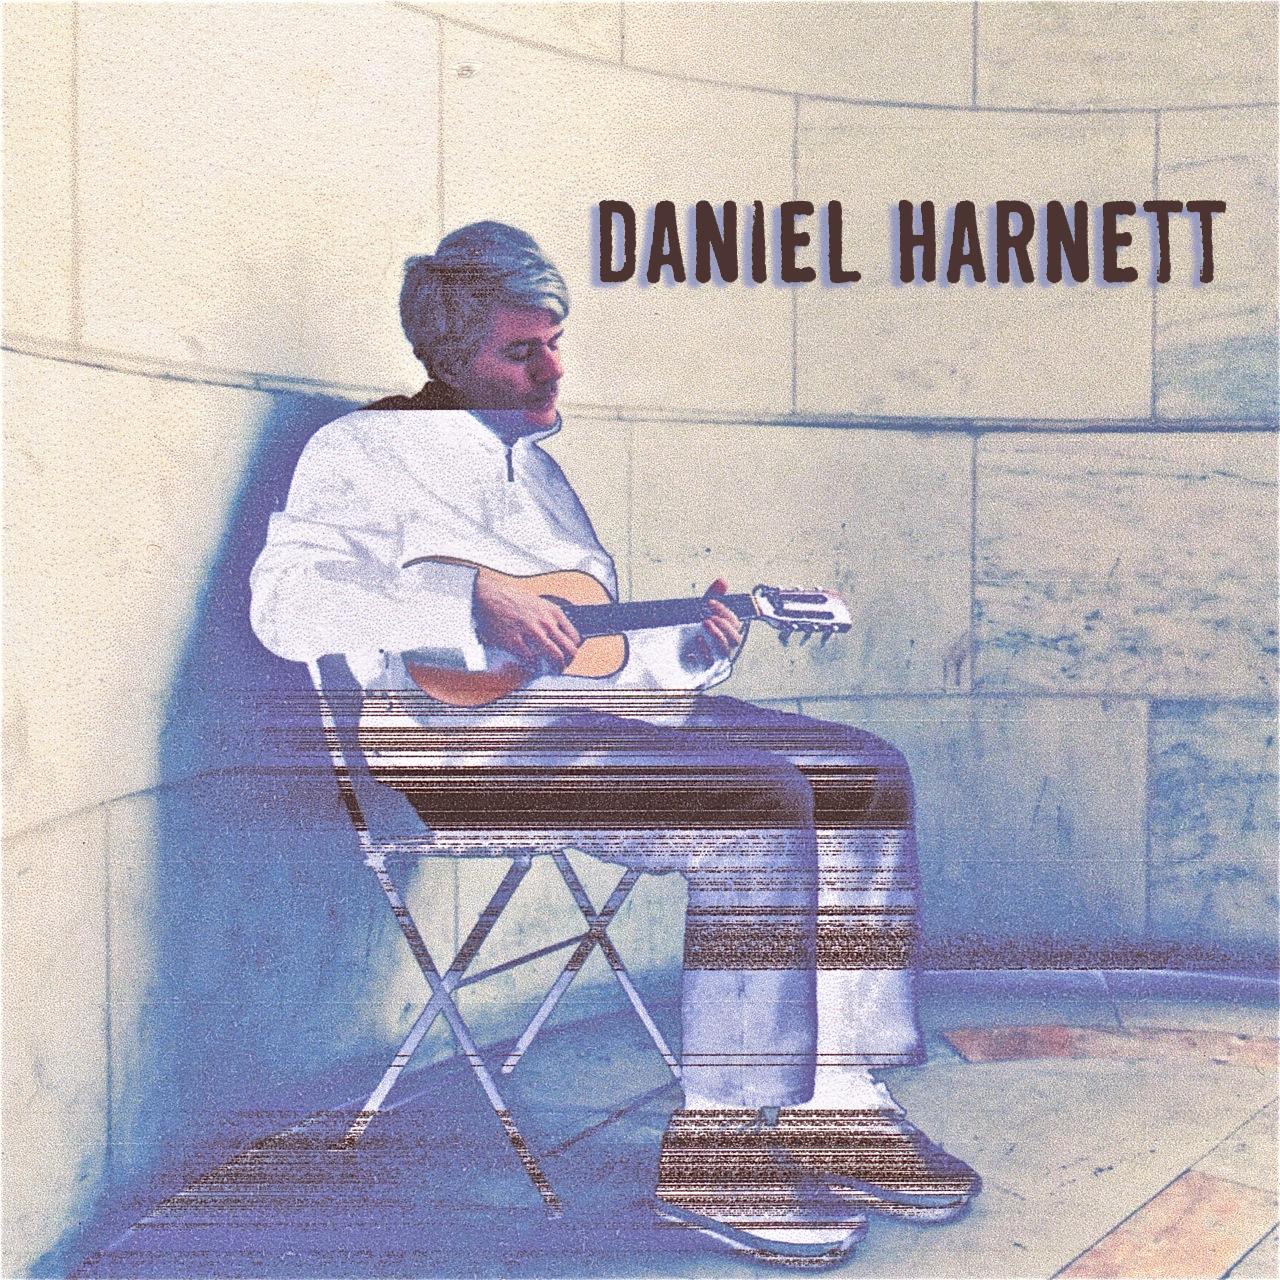 Daniel Harnett